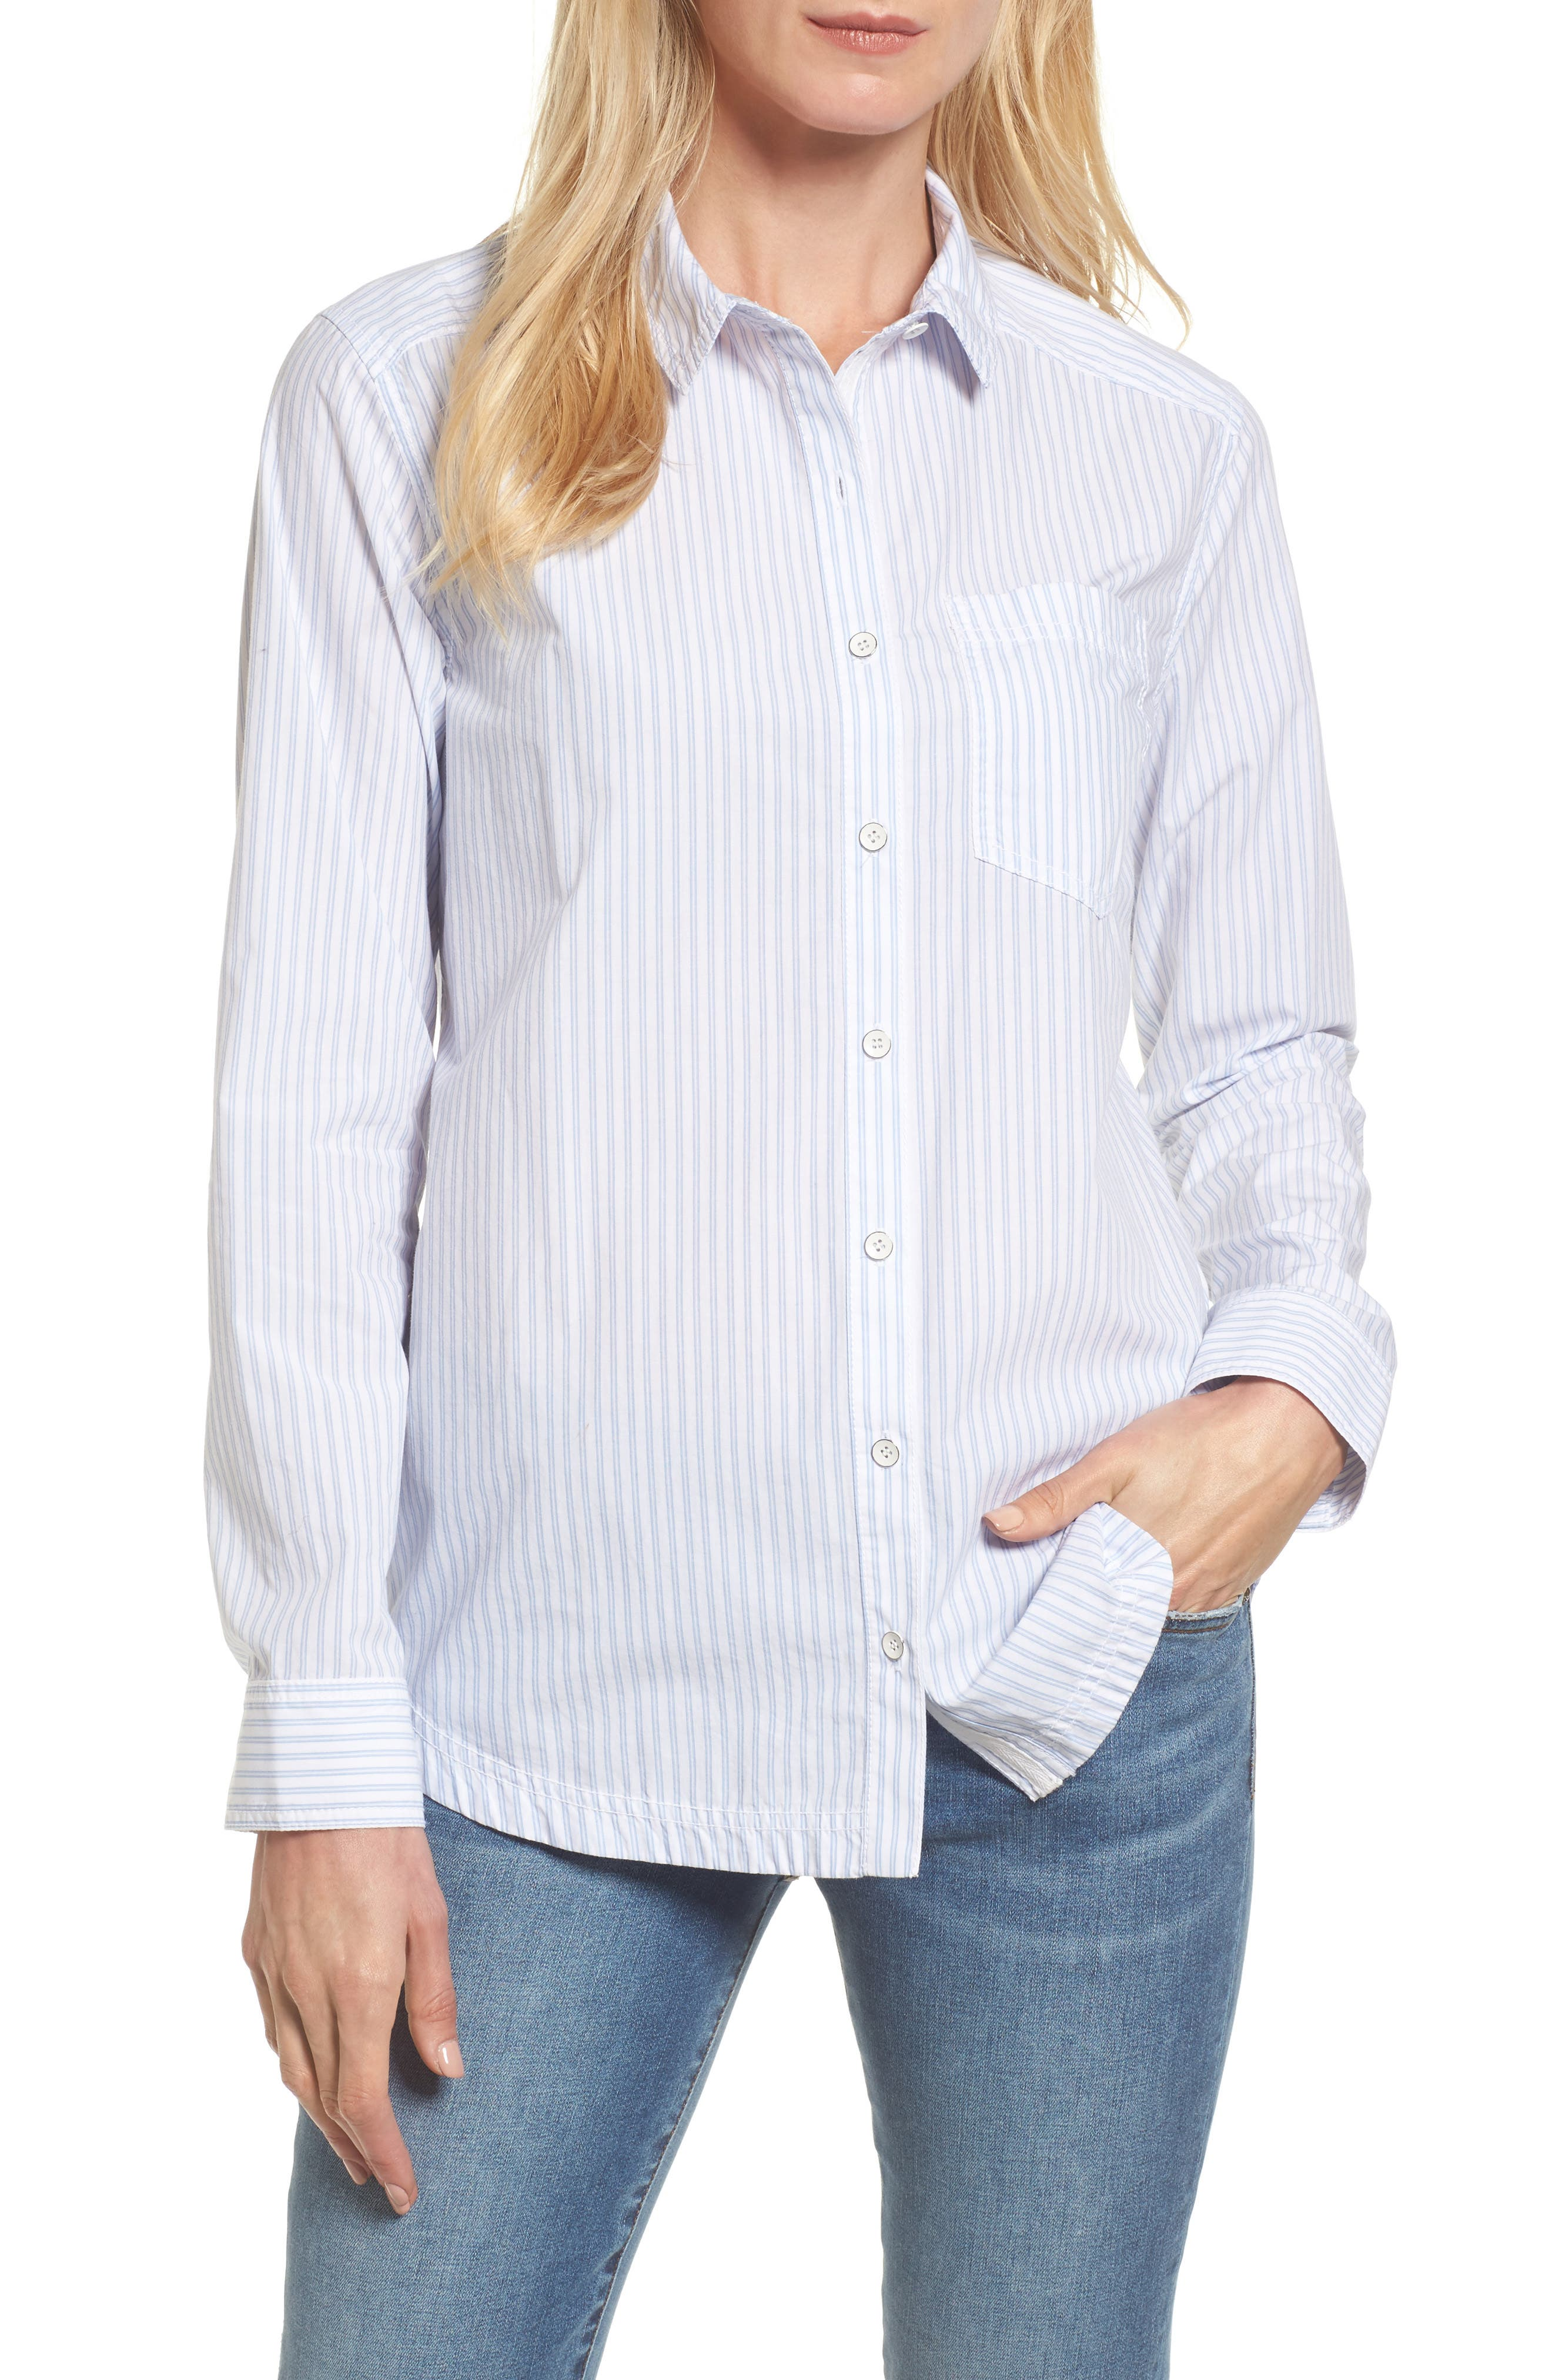 Button Front Pocket Shirt,                             Main thumbnail 1, color,                             White- Blue Stripe